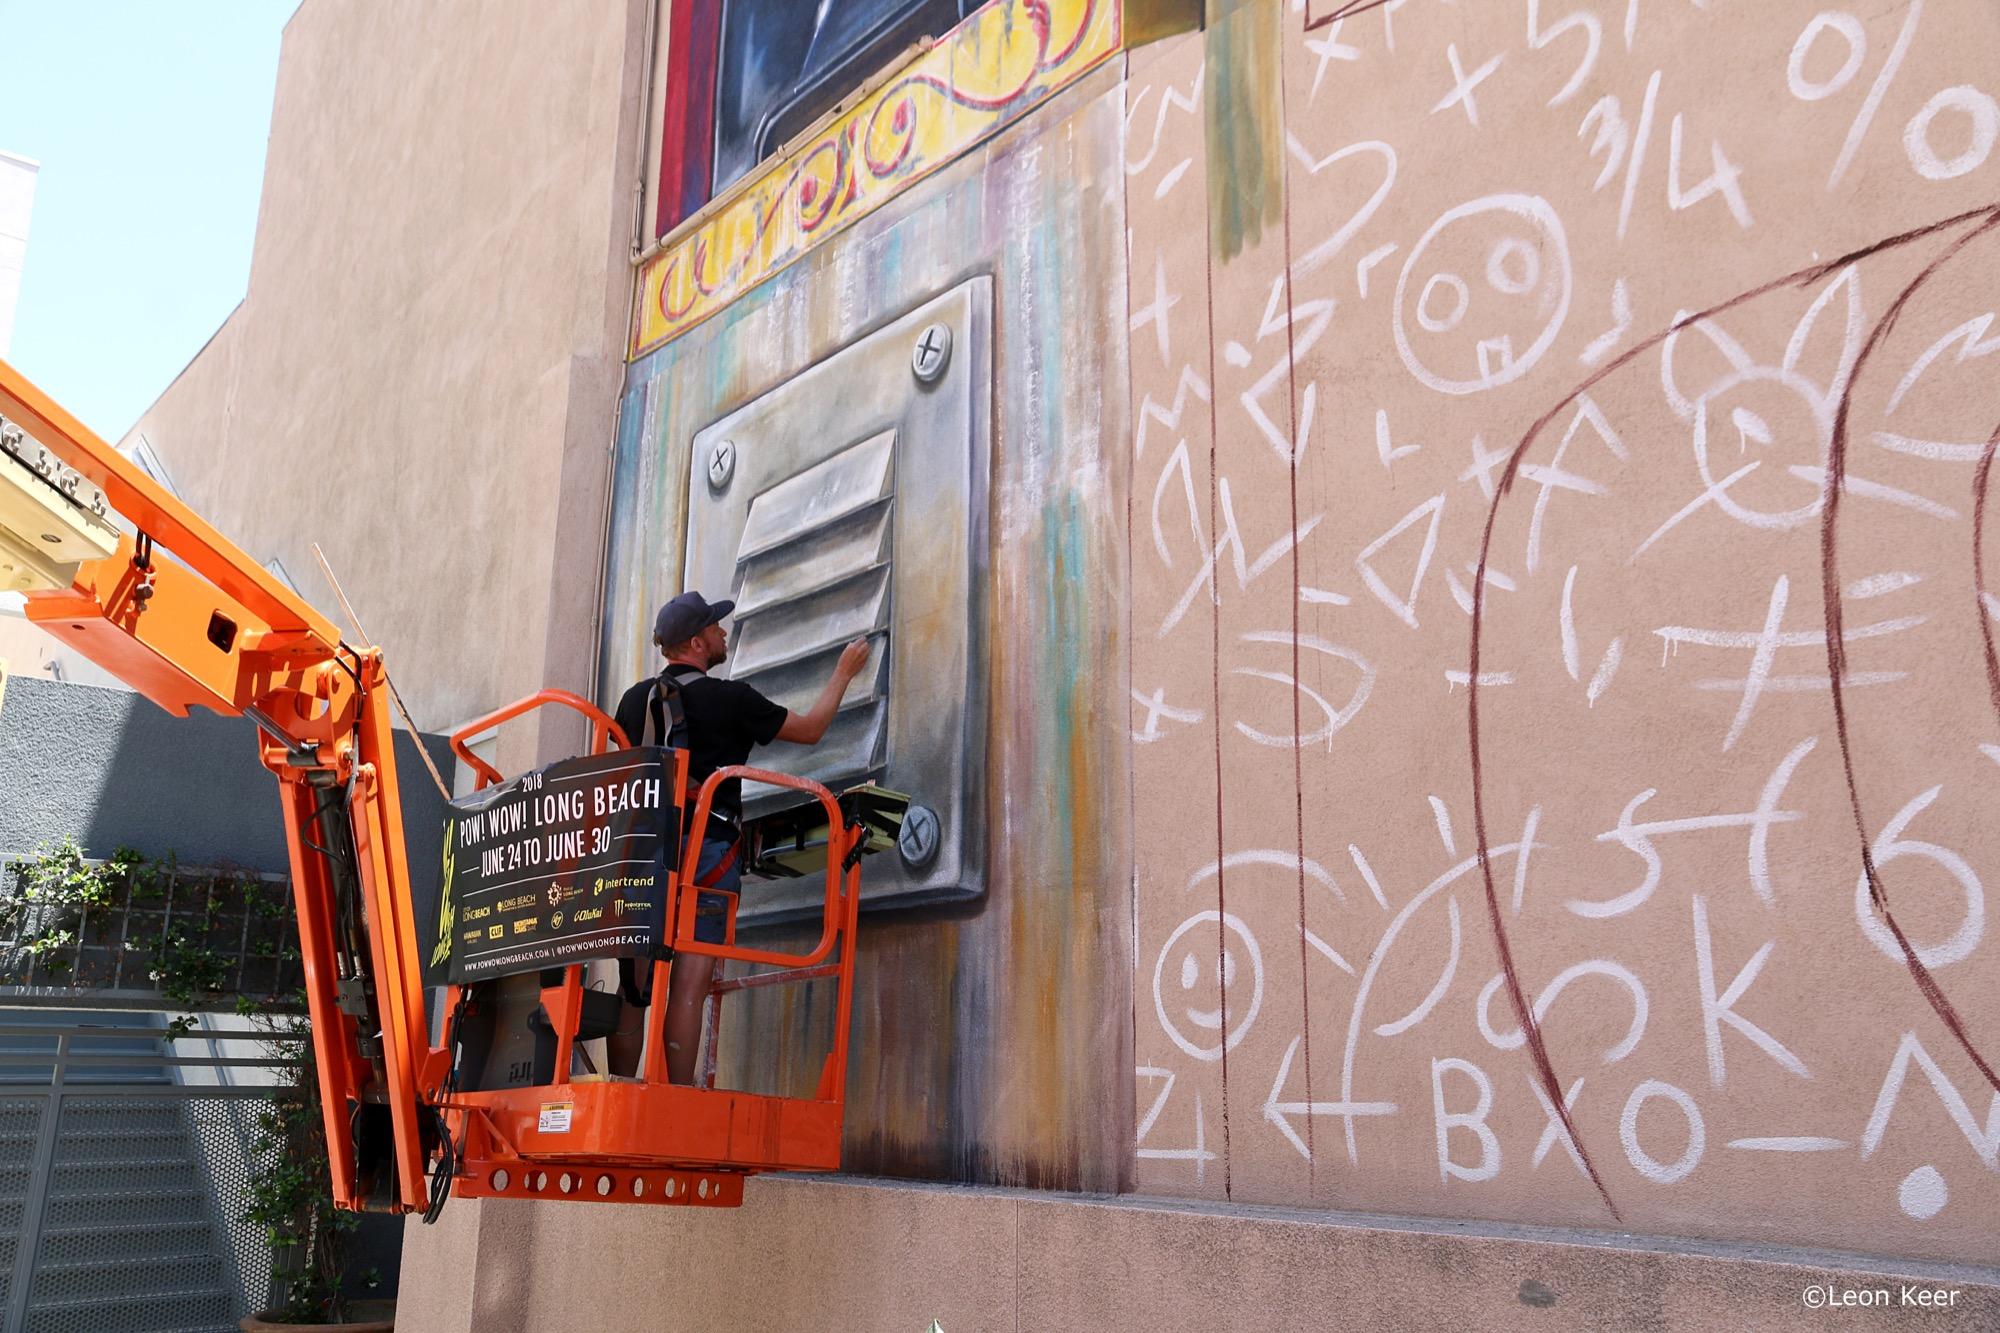 Leon Keer in Long Beach, California Artes & contextos details leon keer powwow 41482393580 o